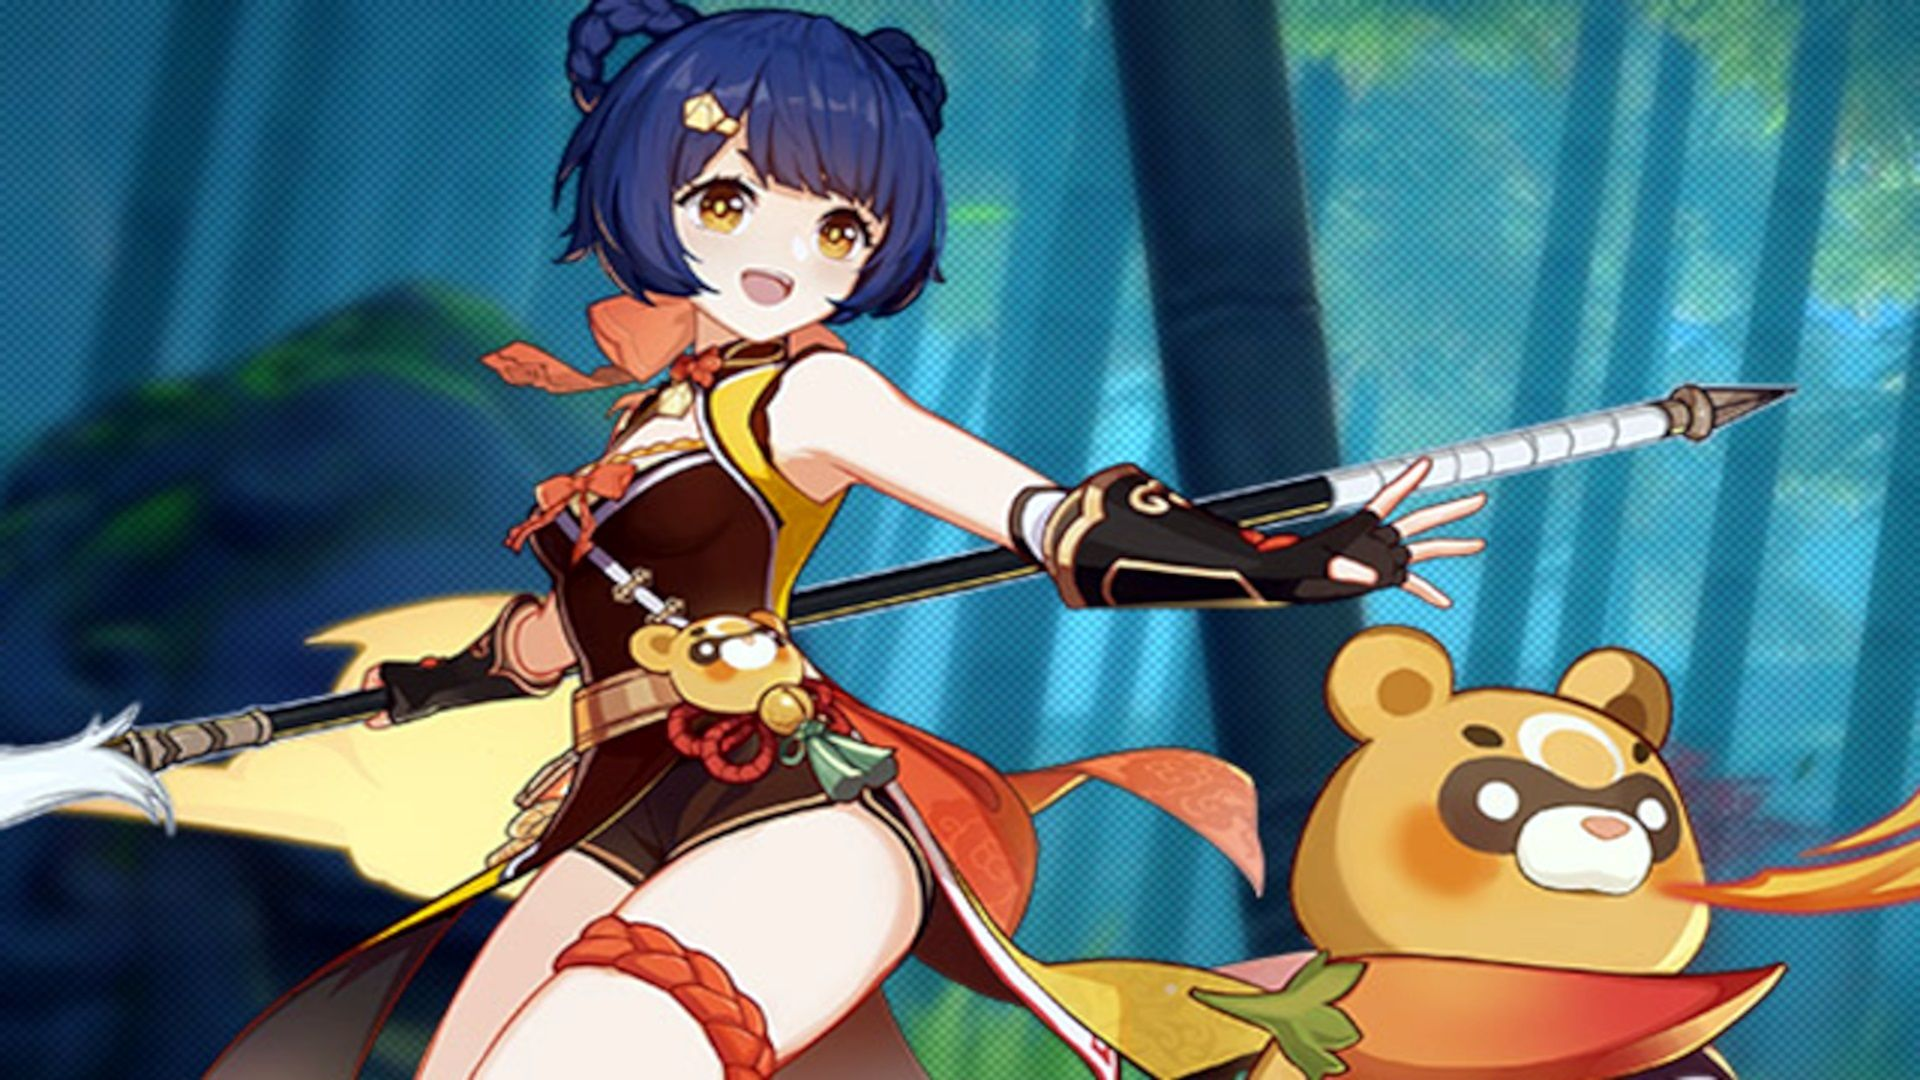 Stats del personaje Xiangling en el videojuego Genshin Impact